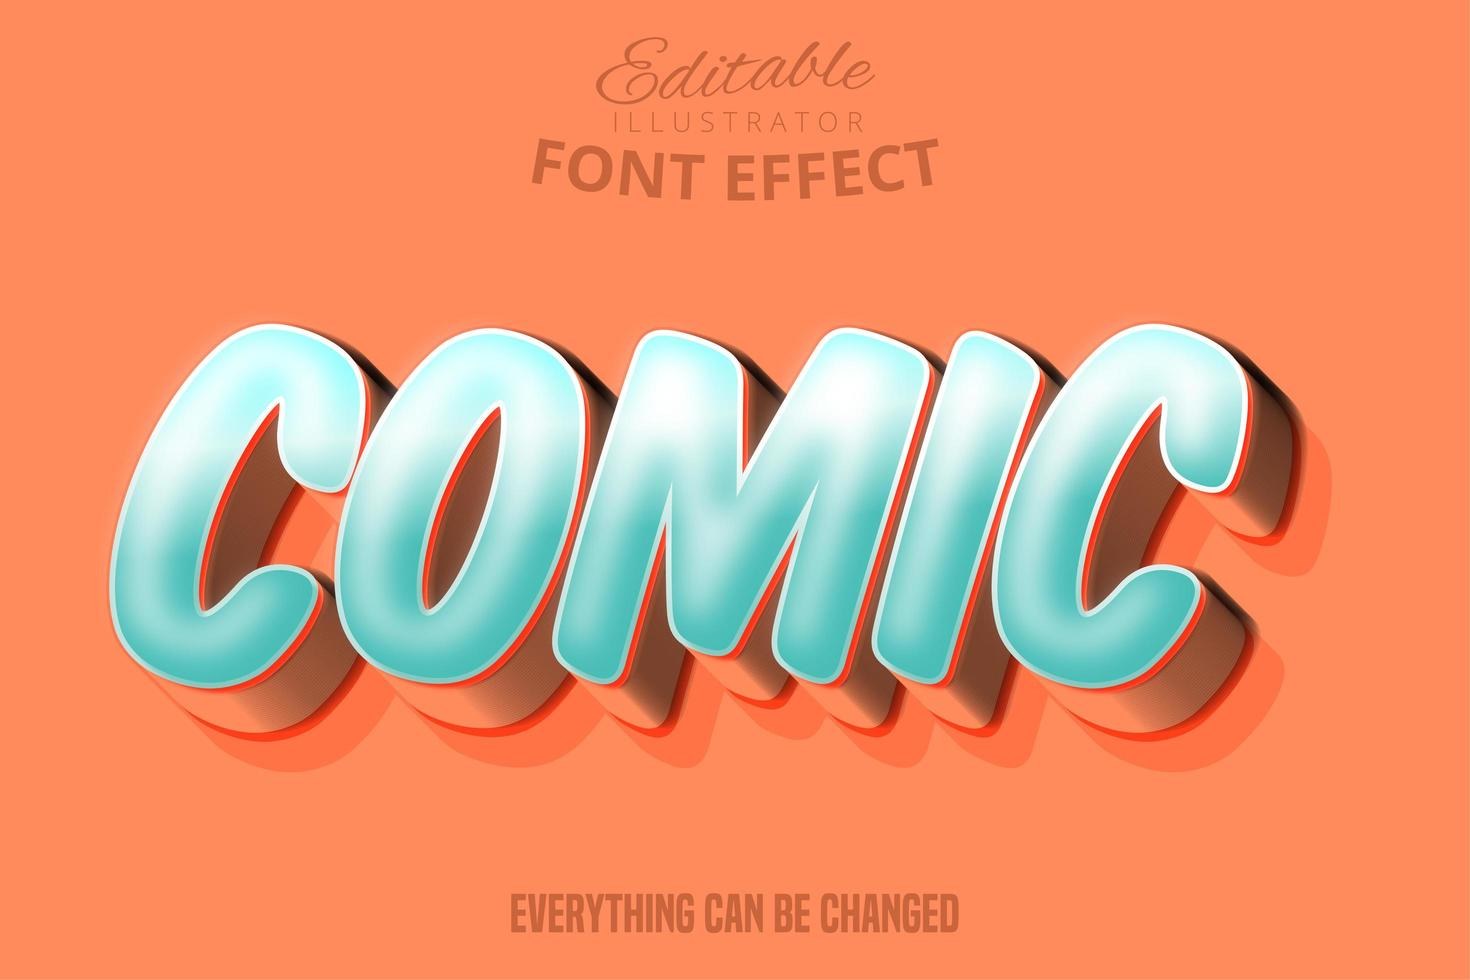 Moderner editierbarer Typografie-Gusseffekt des Comic-Skripts vektor